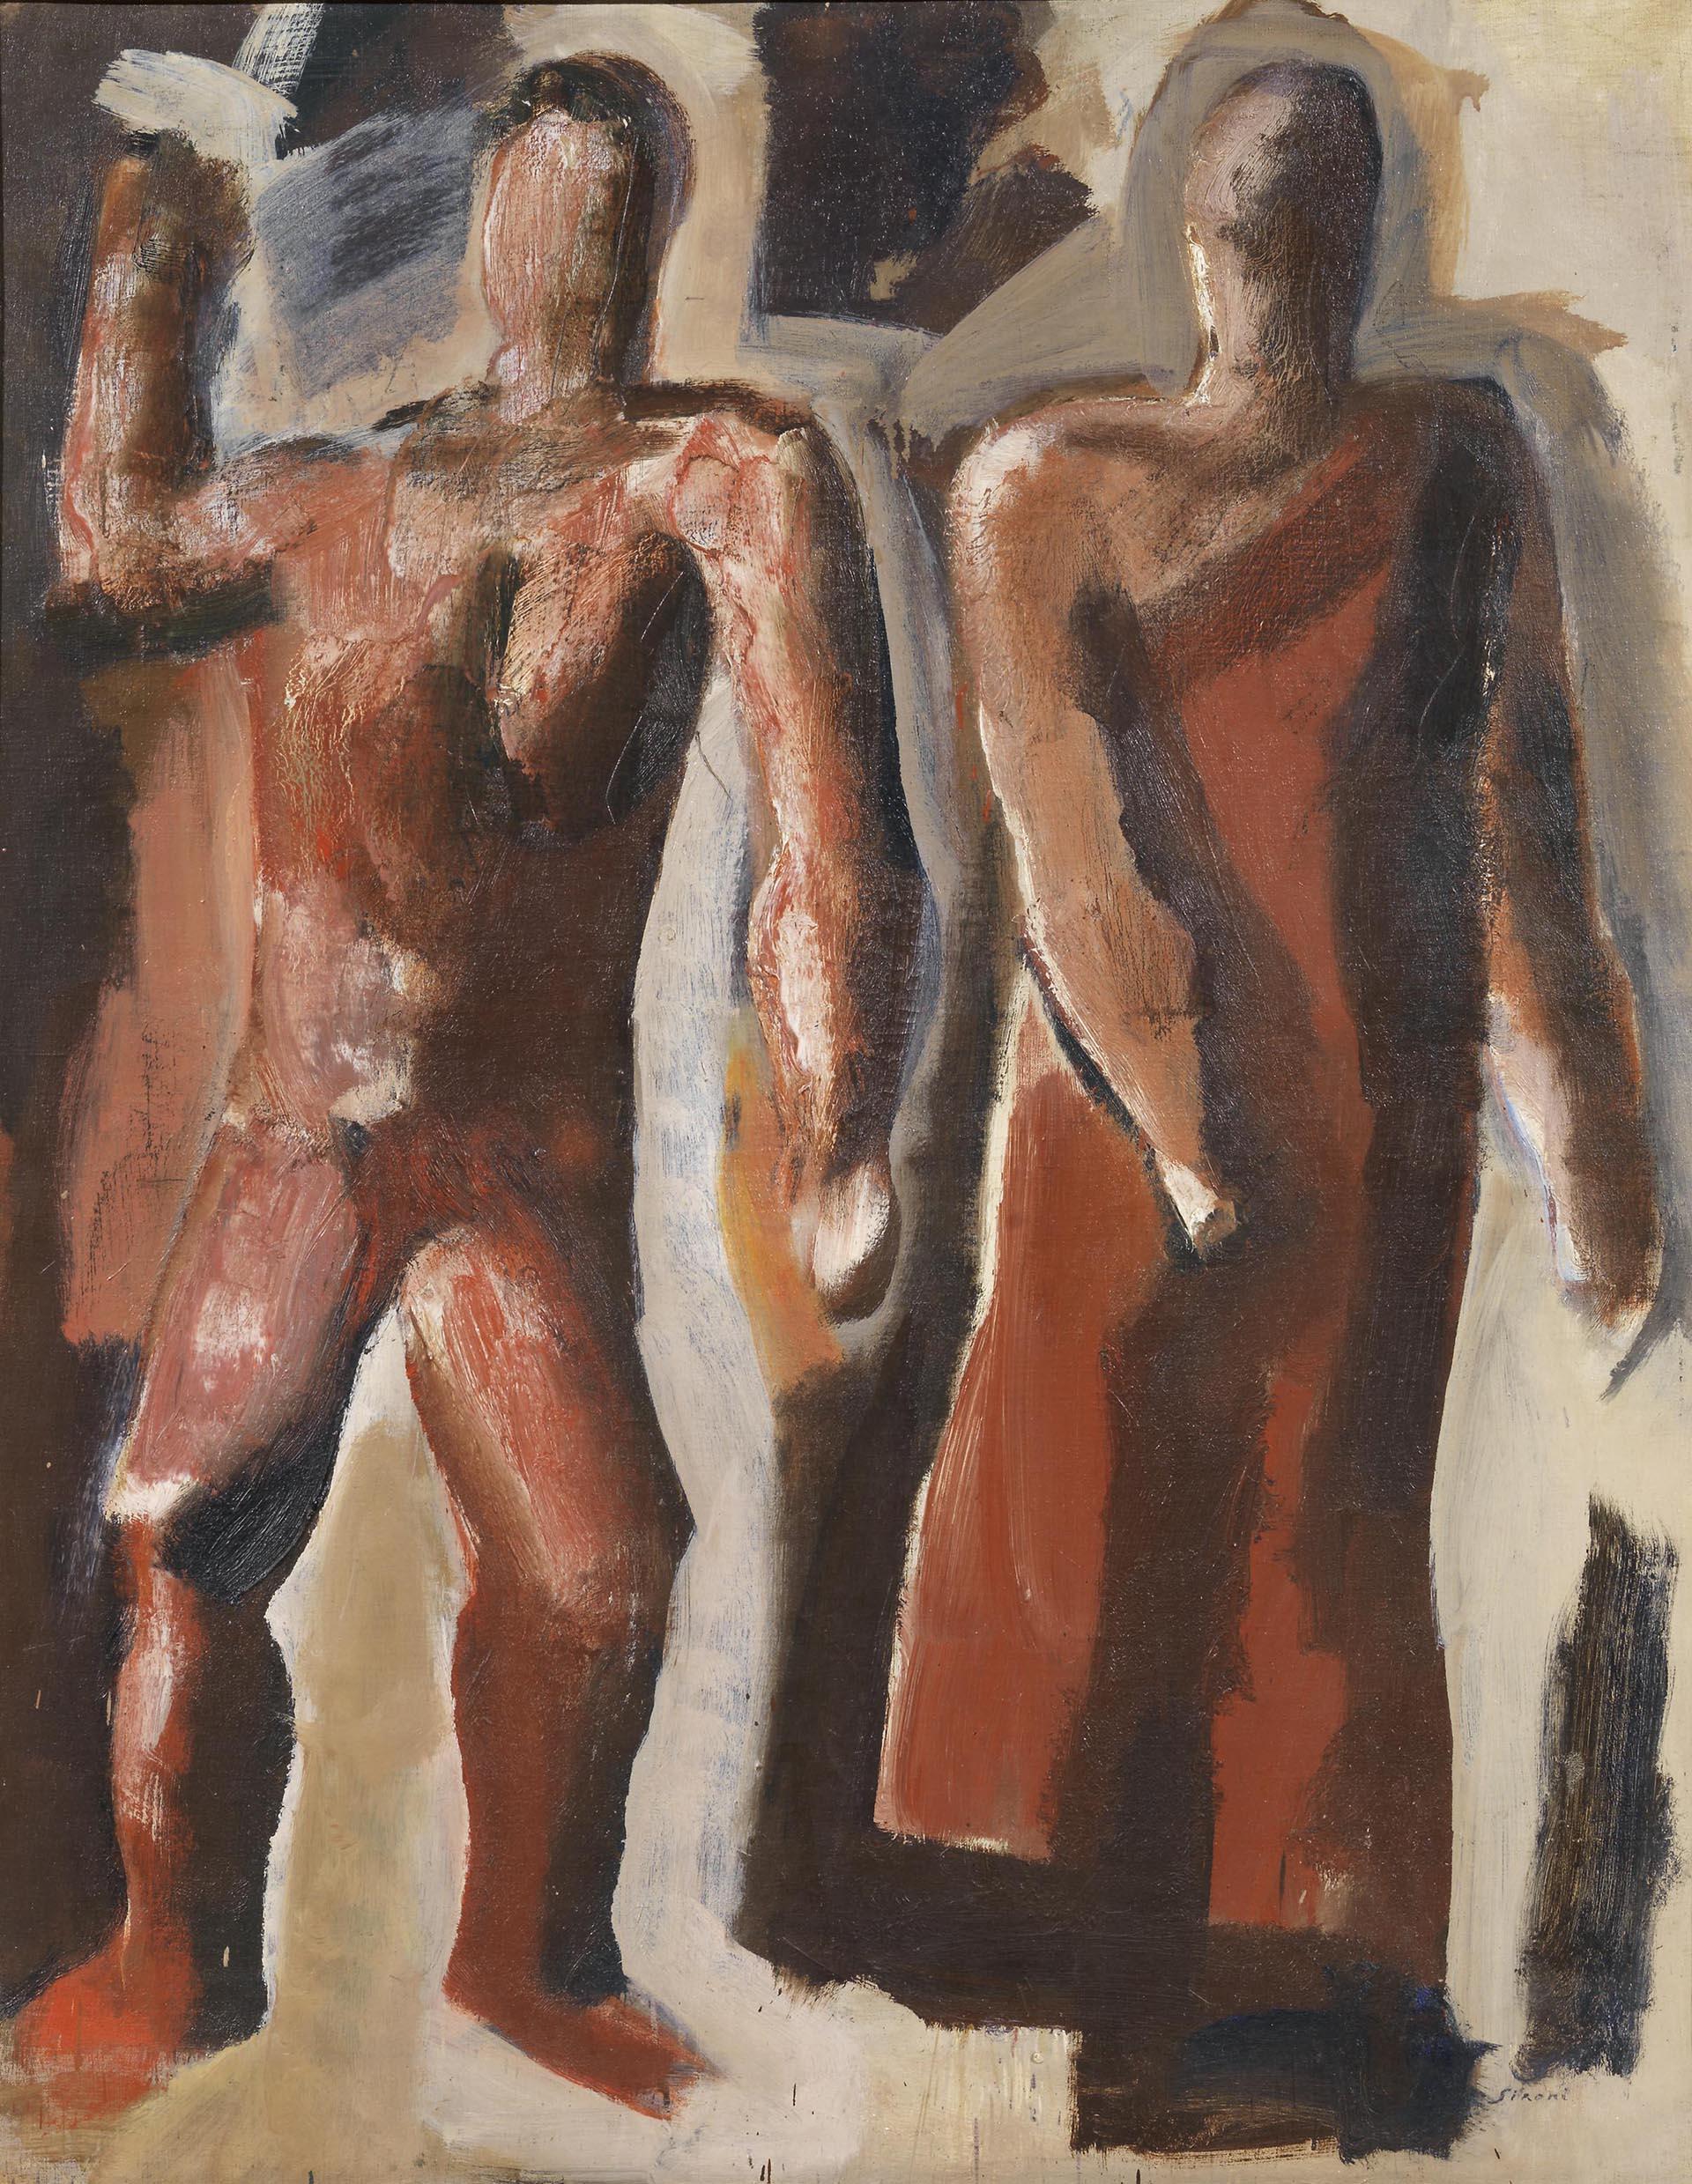 Sironi, Due figure, 1930 ca, 100x80 cm